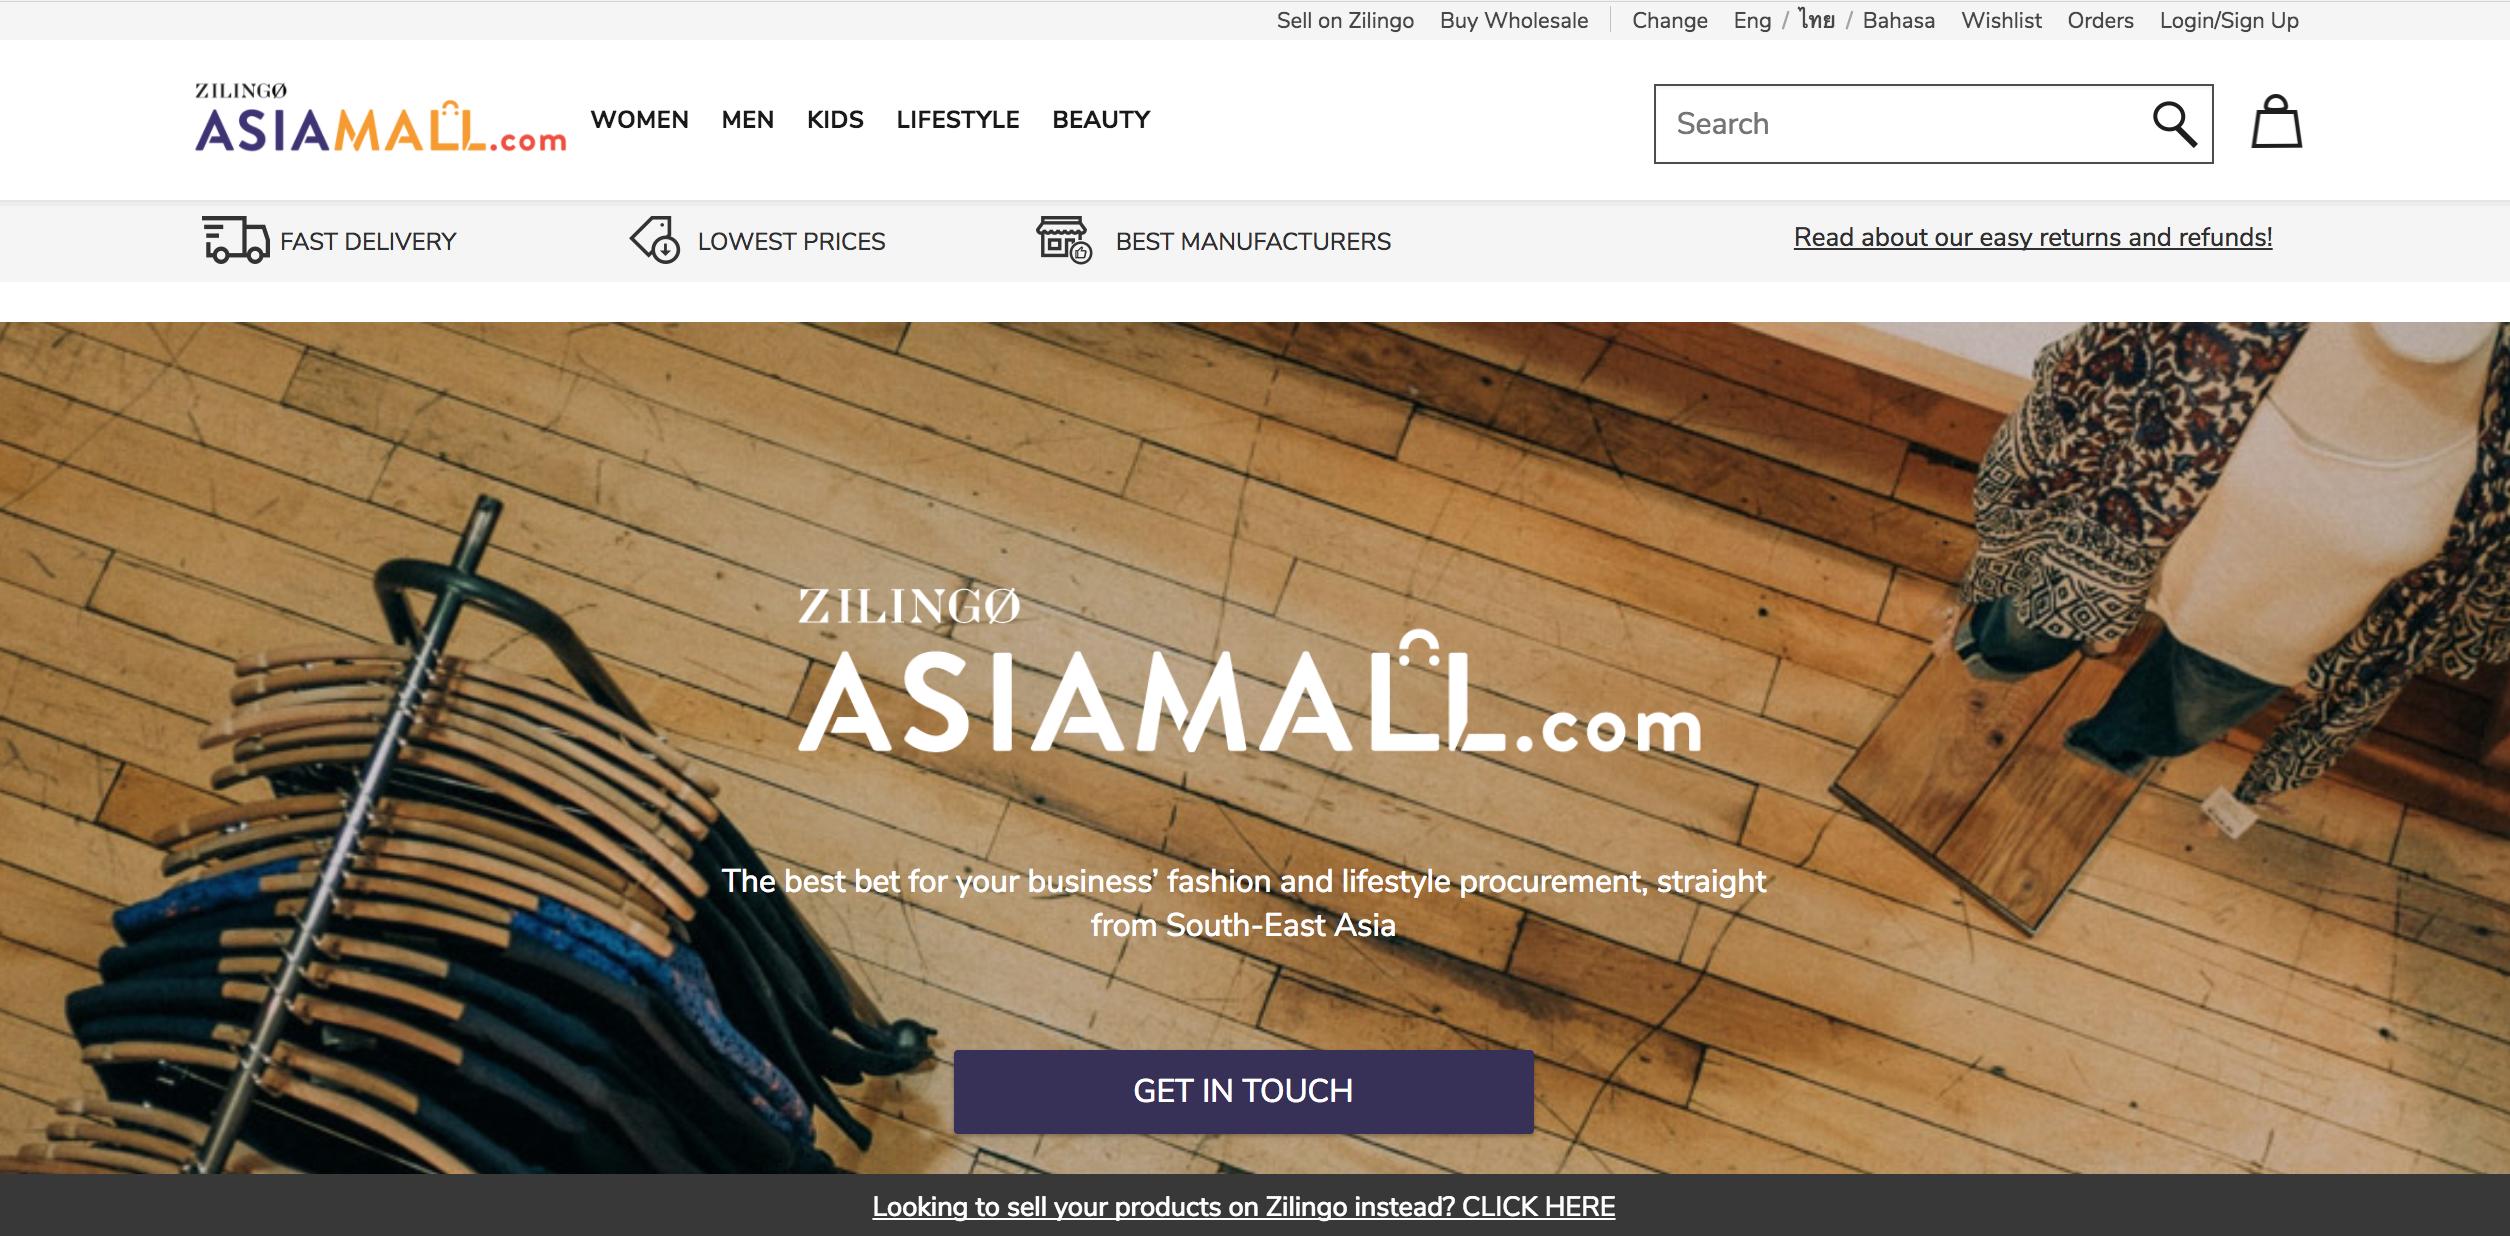 Zilingo Asia Mall